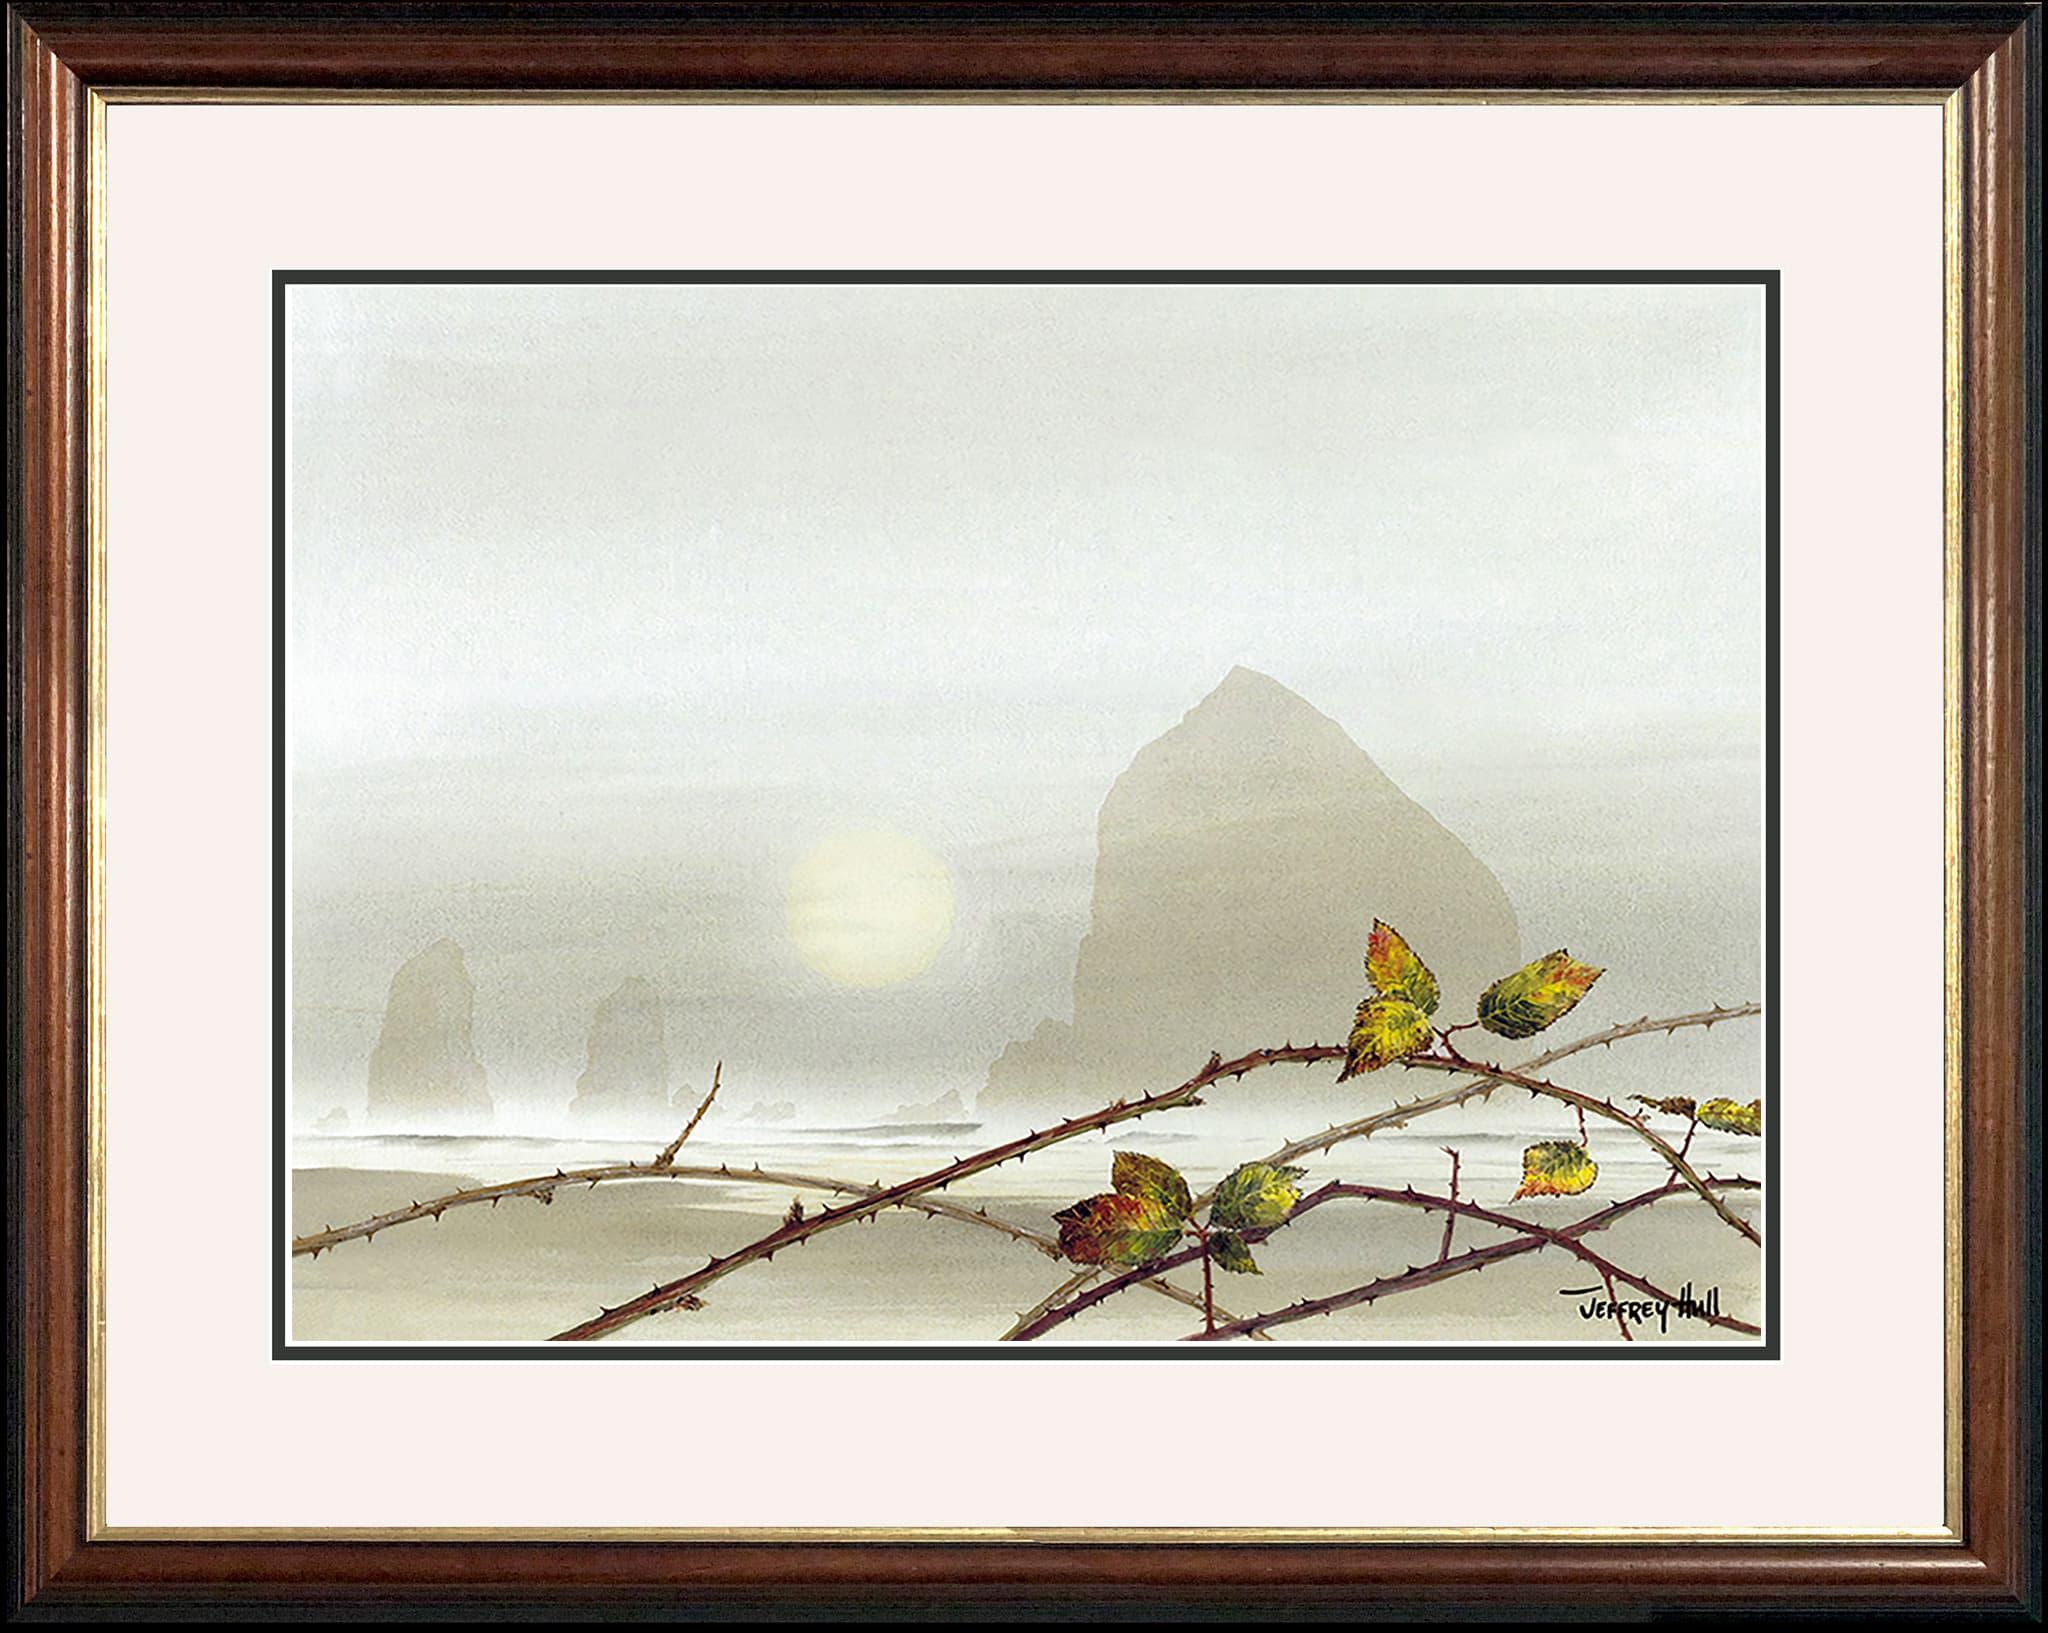 Bound-For-Winter-LimEd-Malabar-Talc-Dark-Shale-4-Website-2021